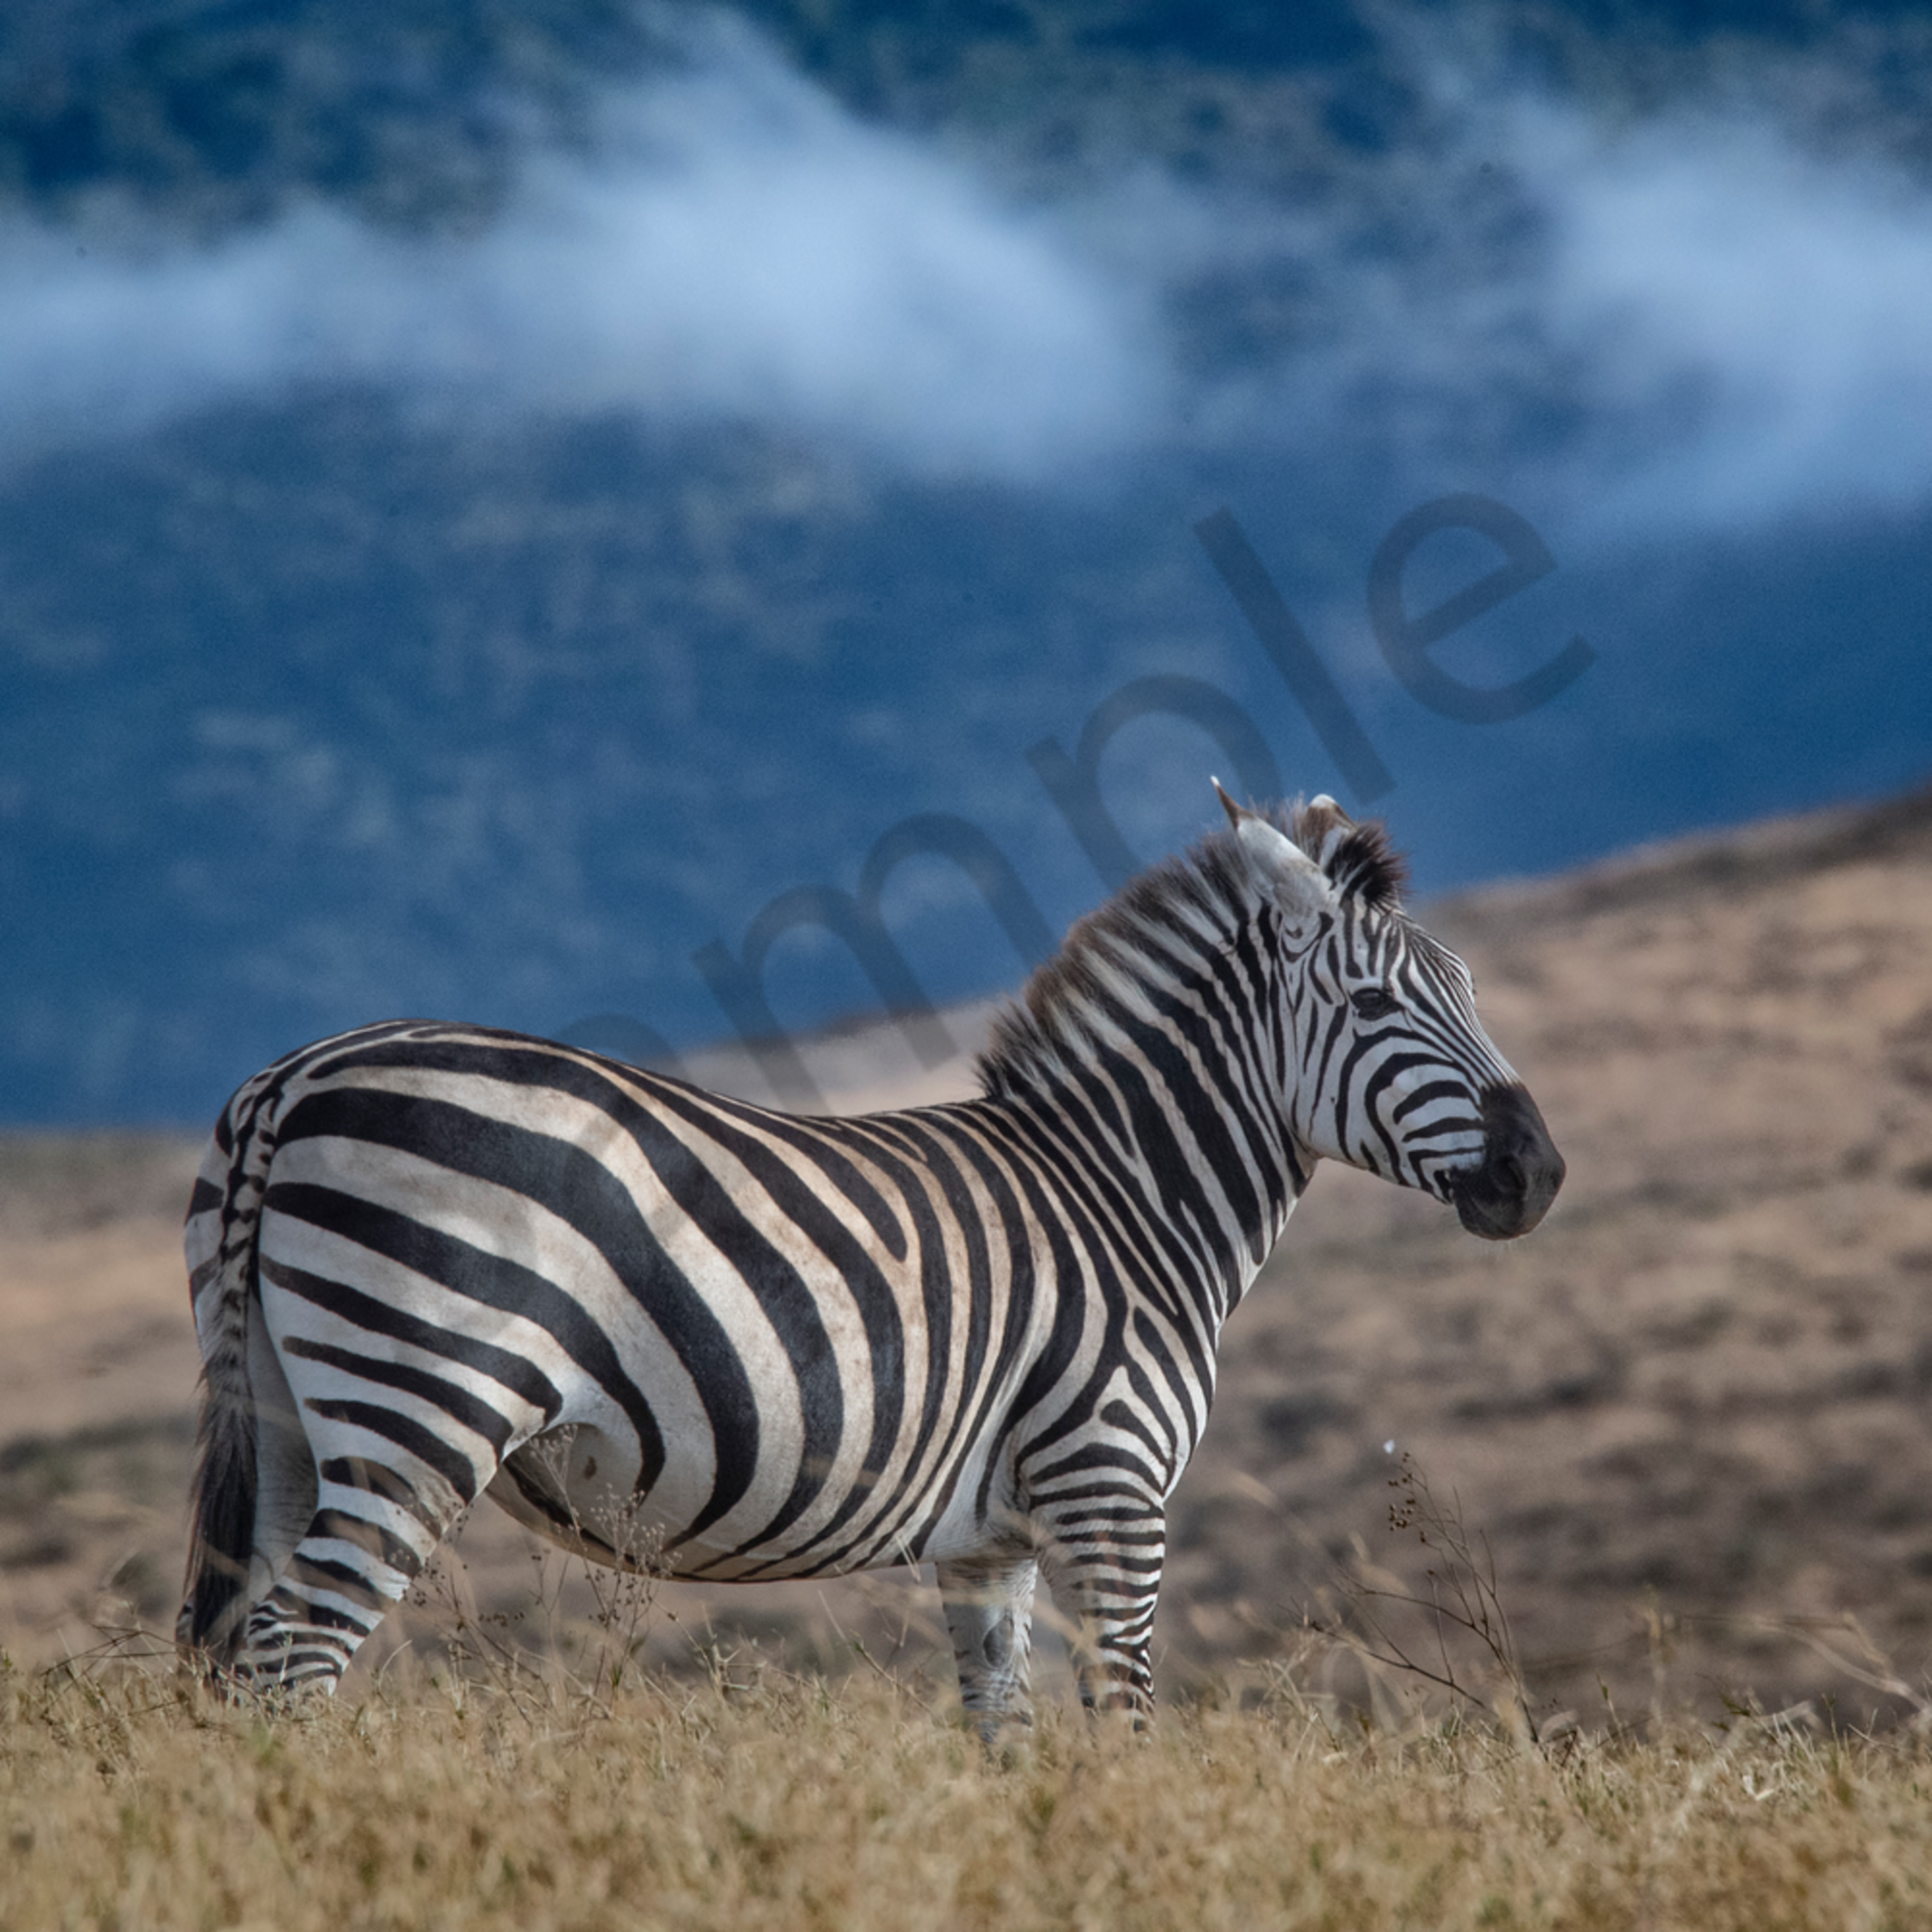 Jps zebra ngorongoro crater bberot